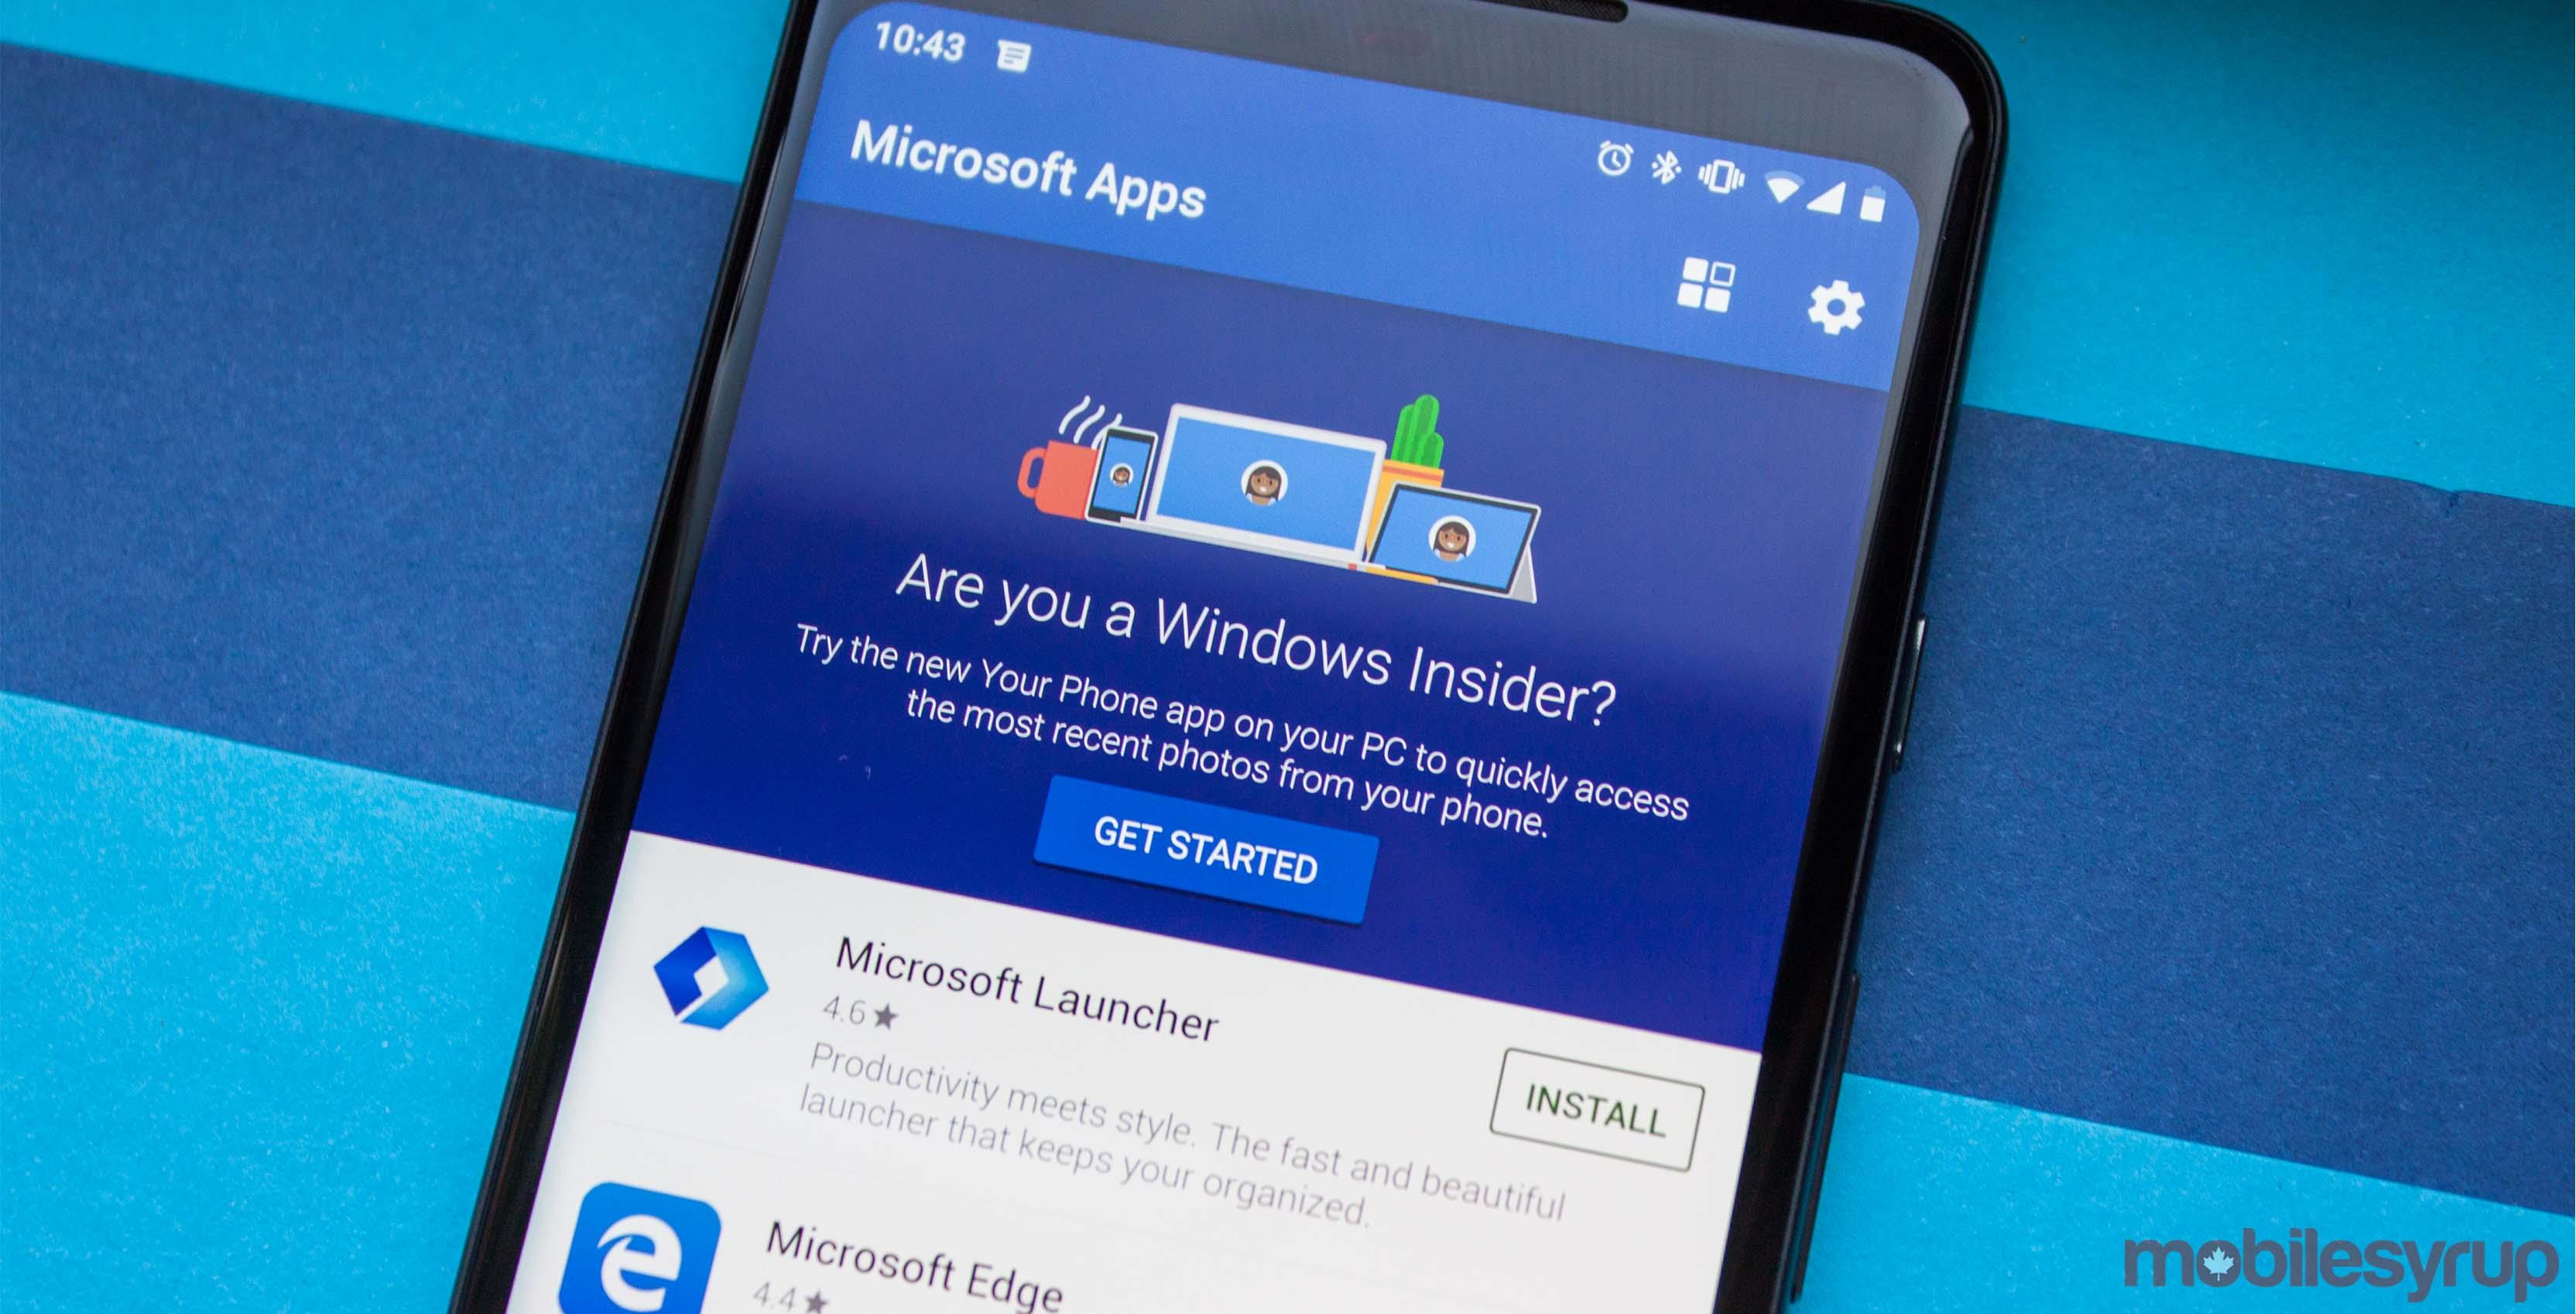 Microsoft Apps app